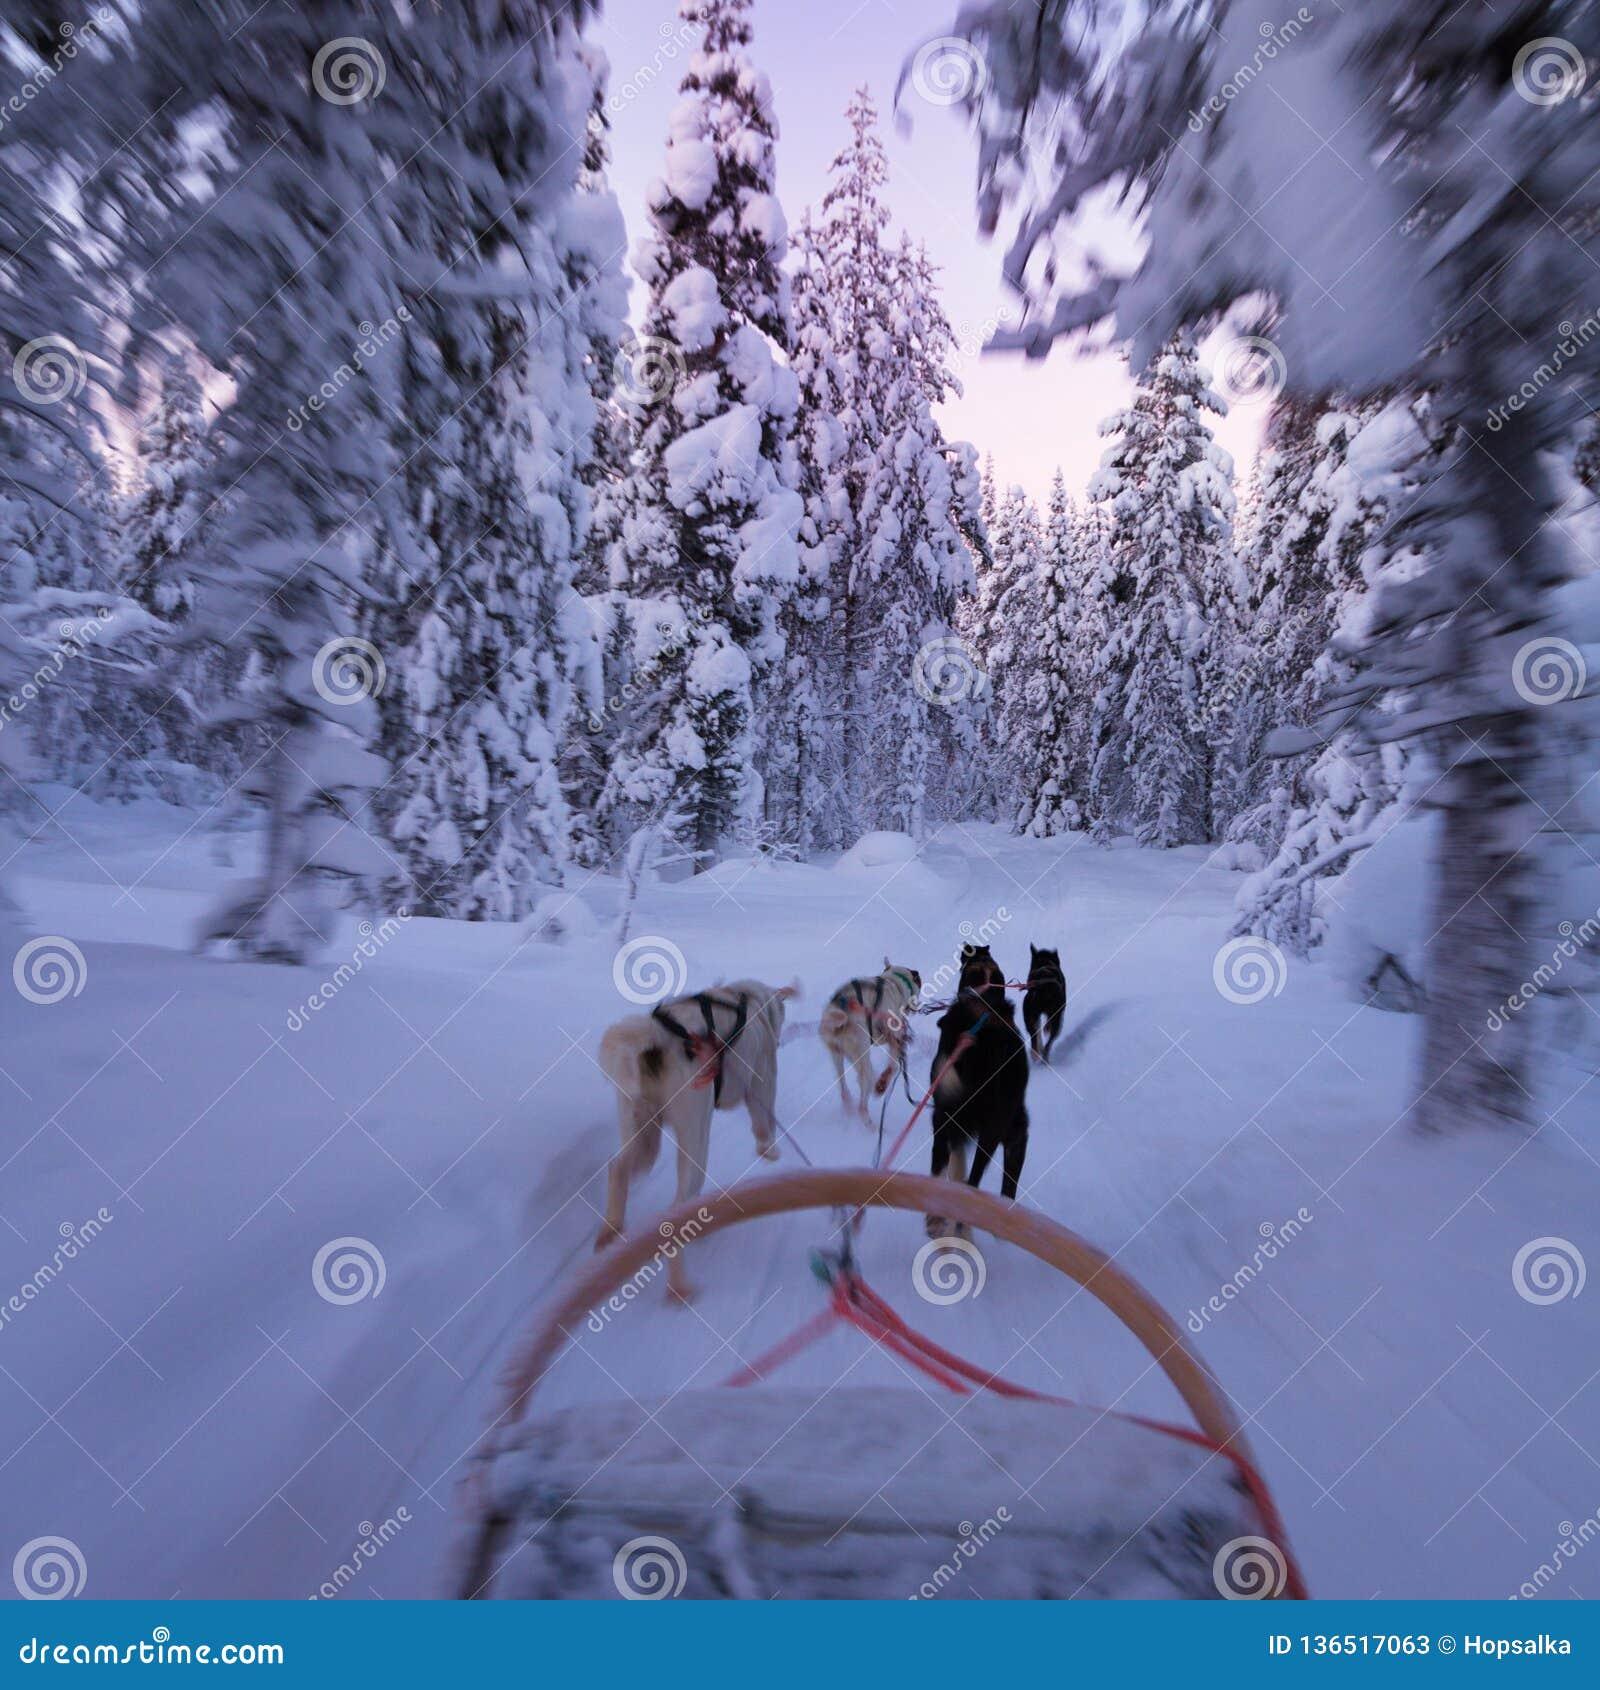 Husky sledge ride at twilight in winter wonderland